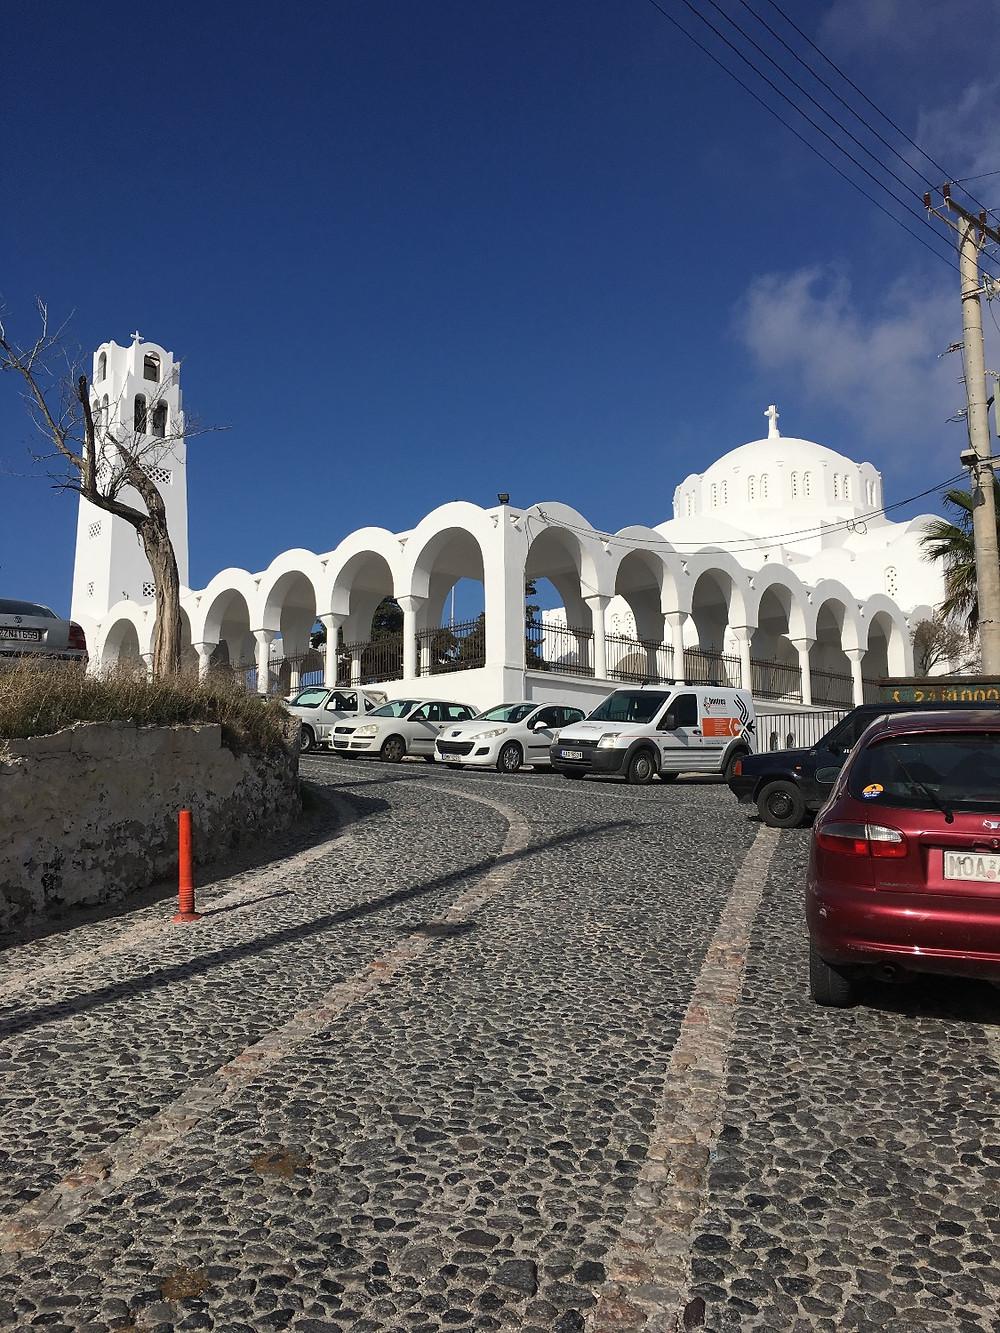 Orthodox Metropolitan Cathedral  Fira, Santorini